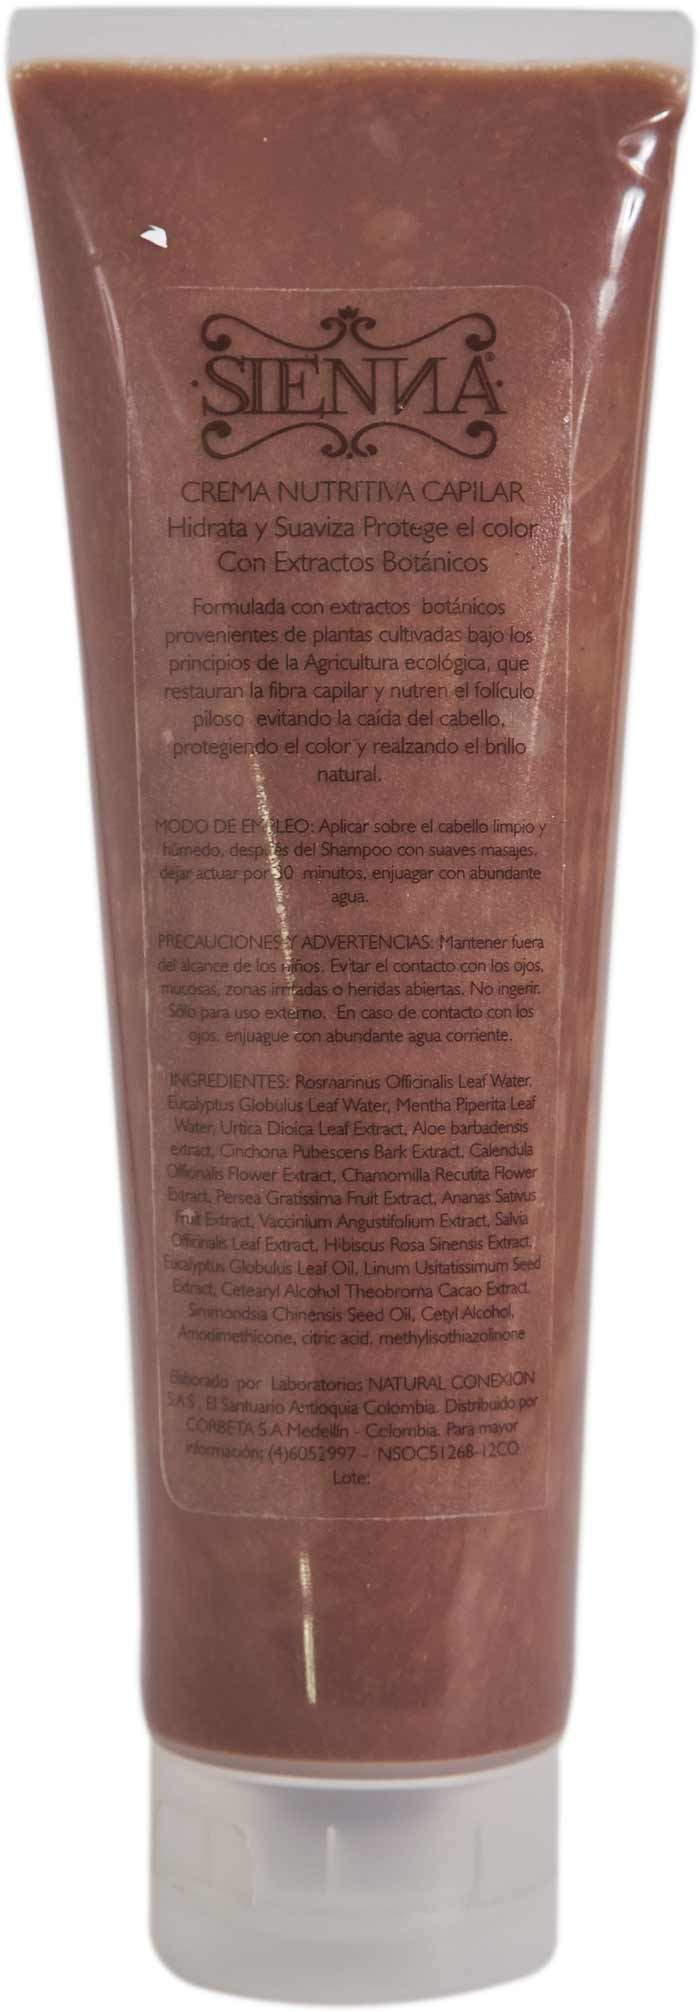 Crema Capilar Cacao Orgánico 280g